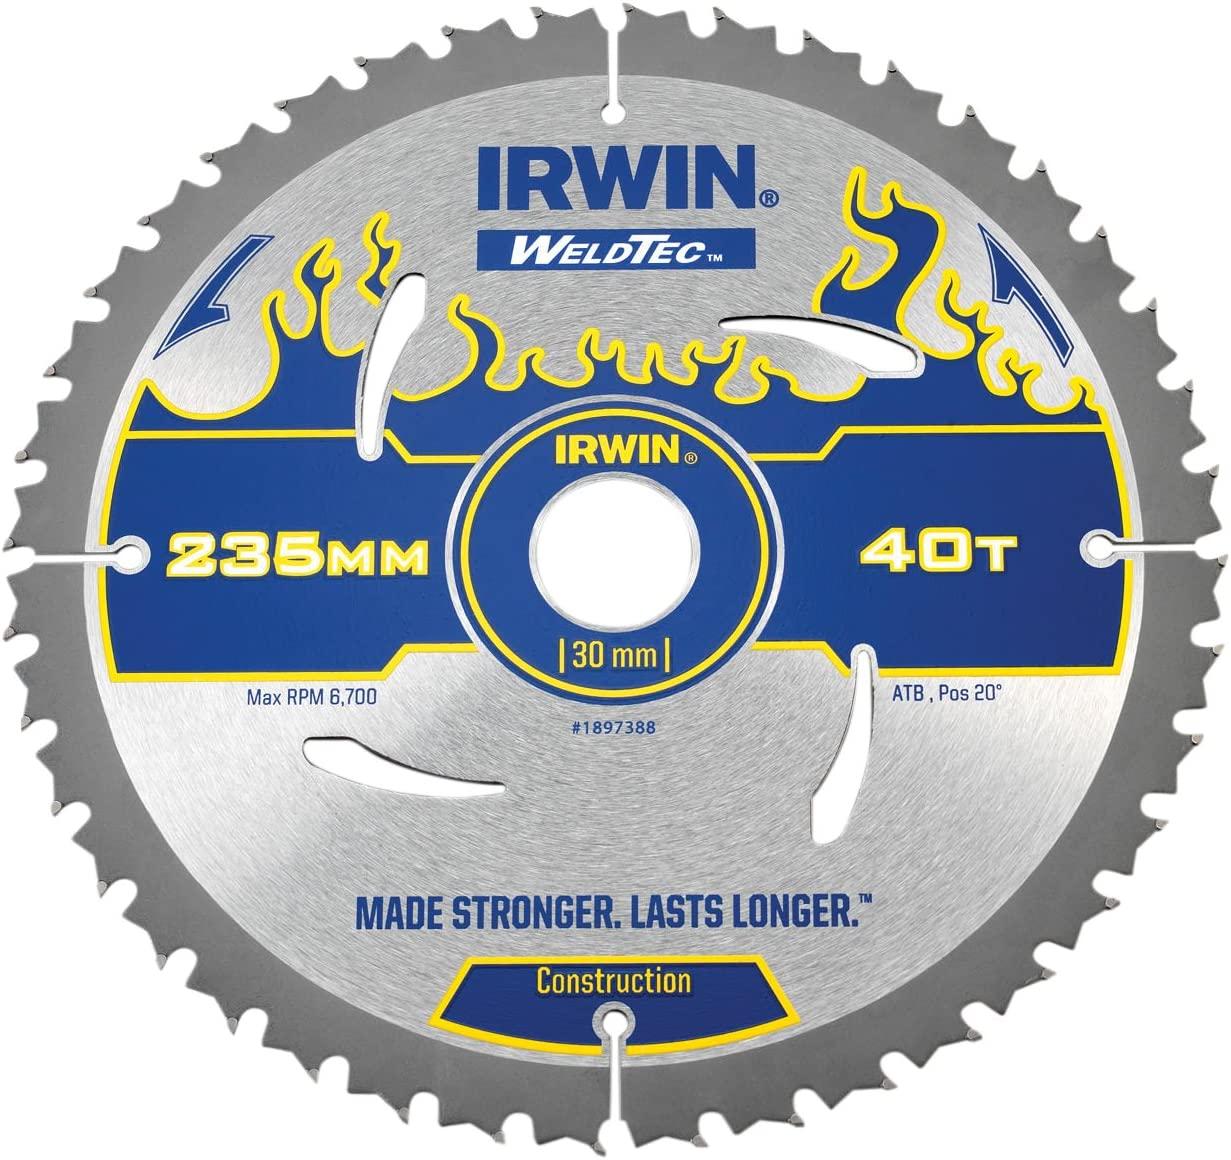 Irwin Tools - Weldtec Circular Saw Blade 235 x 30mm x 40T ATB